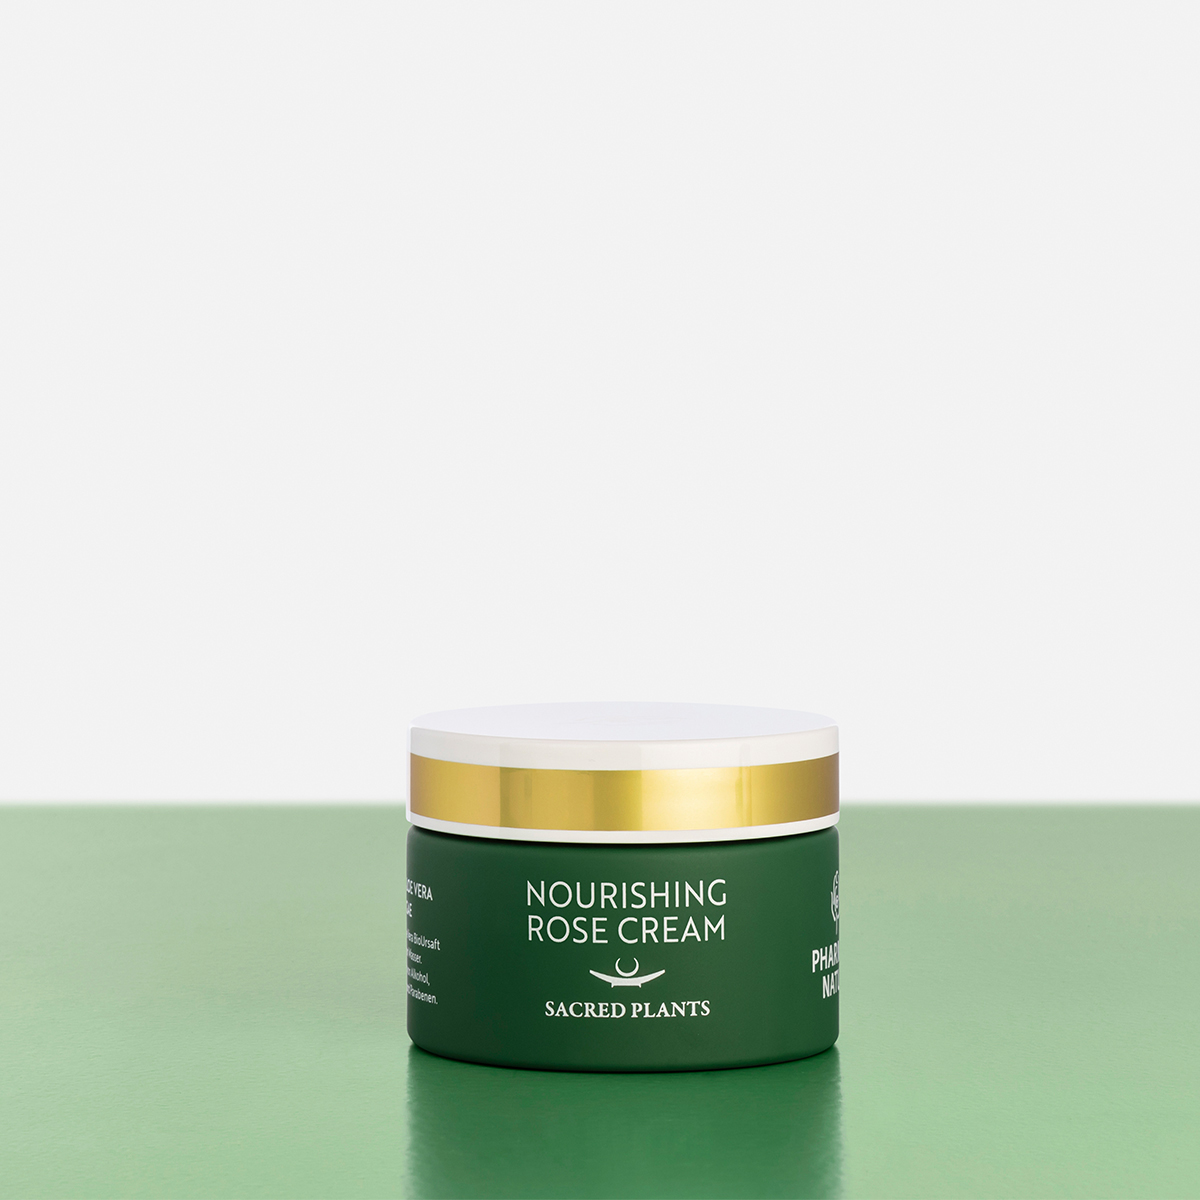 grüne nourishing rose cream Produktbild